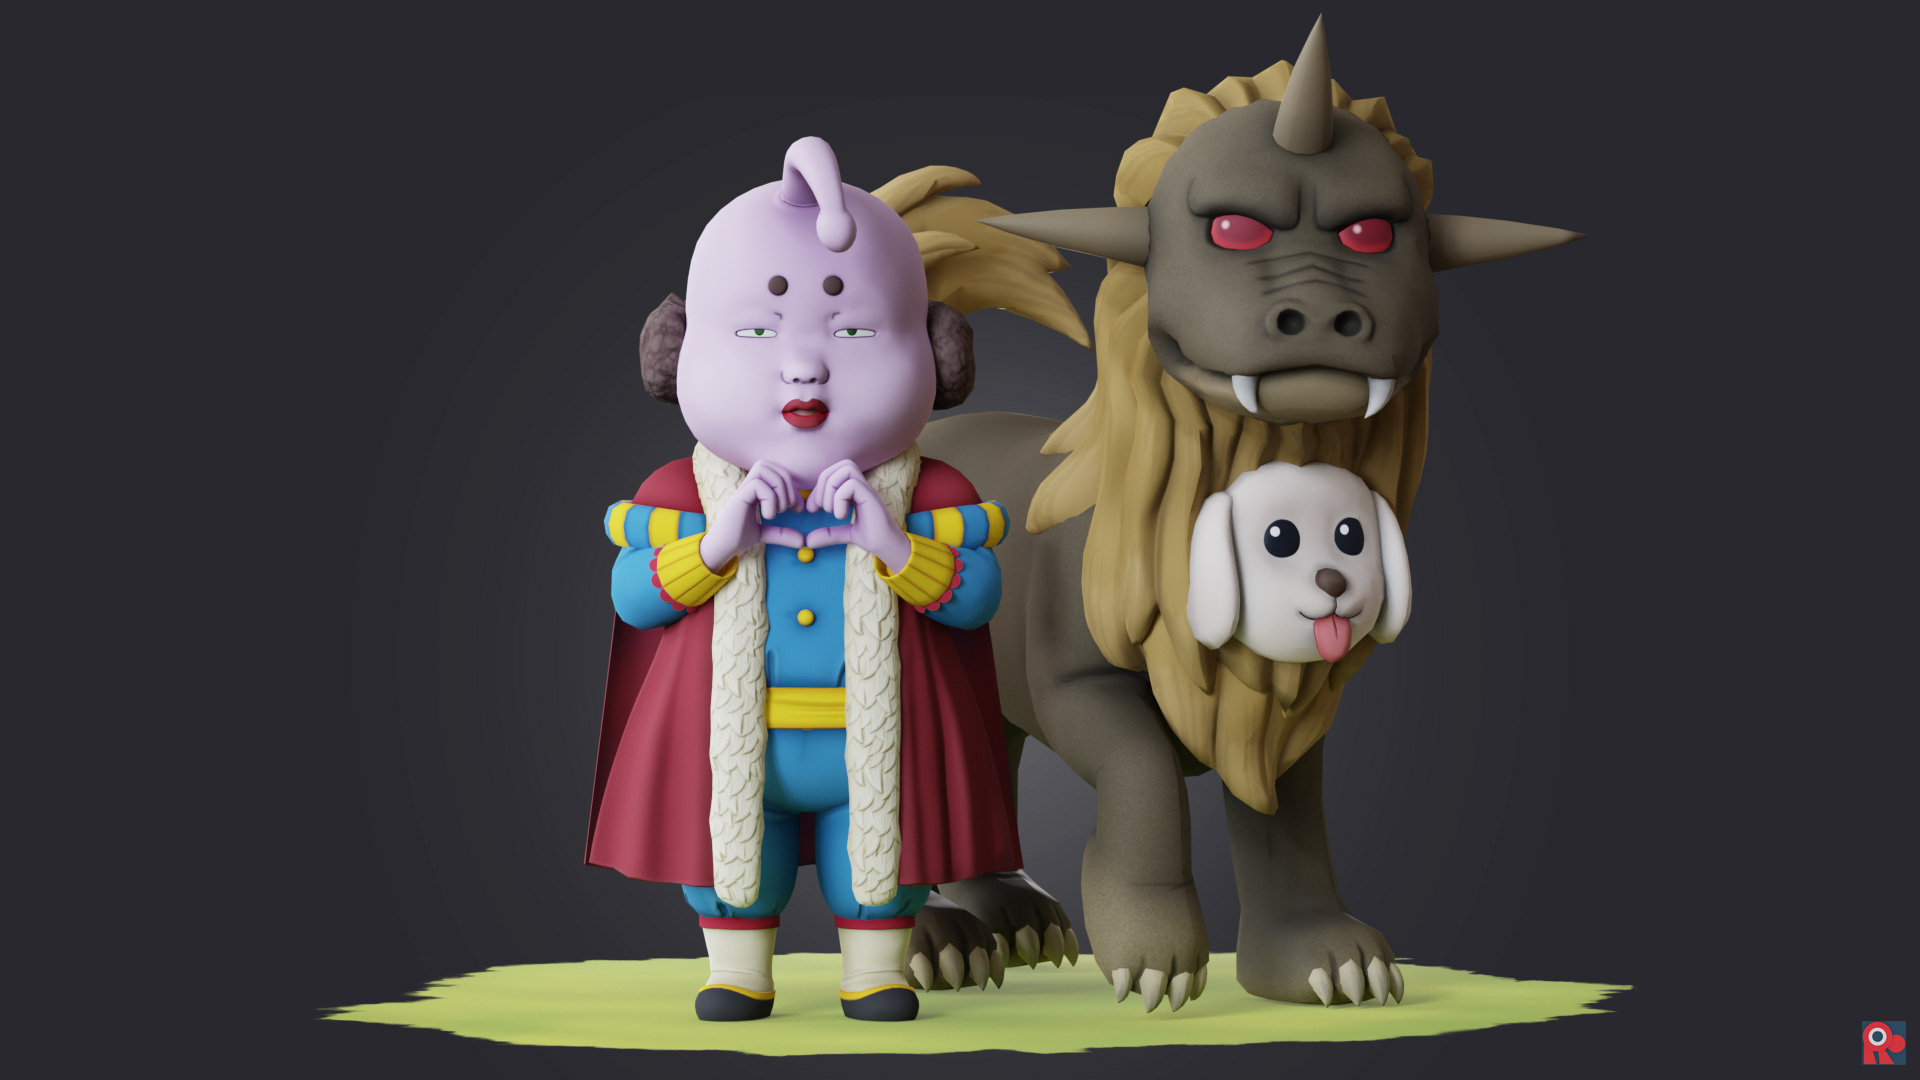 Prince Hata and Pochi